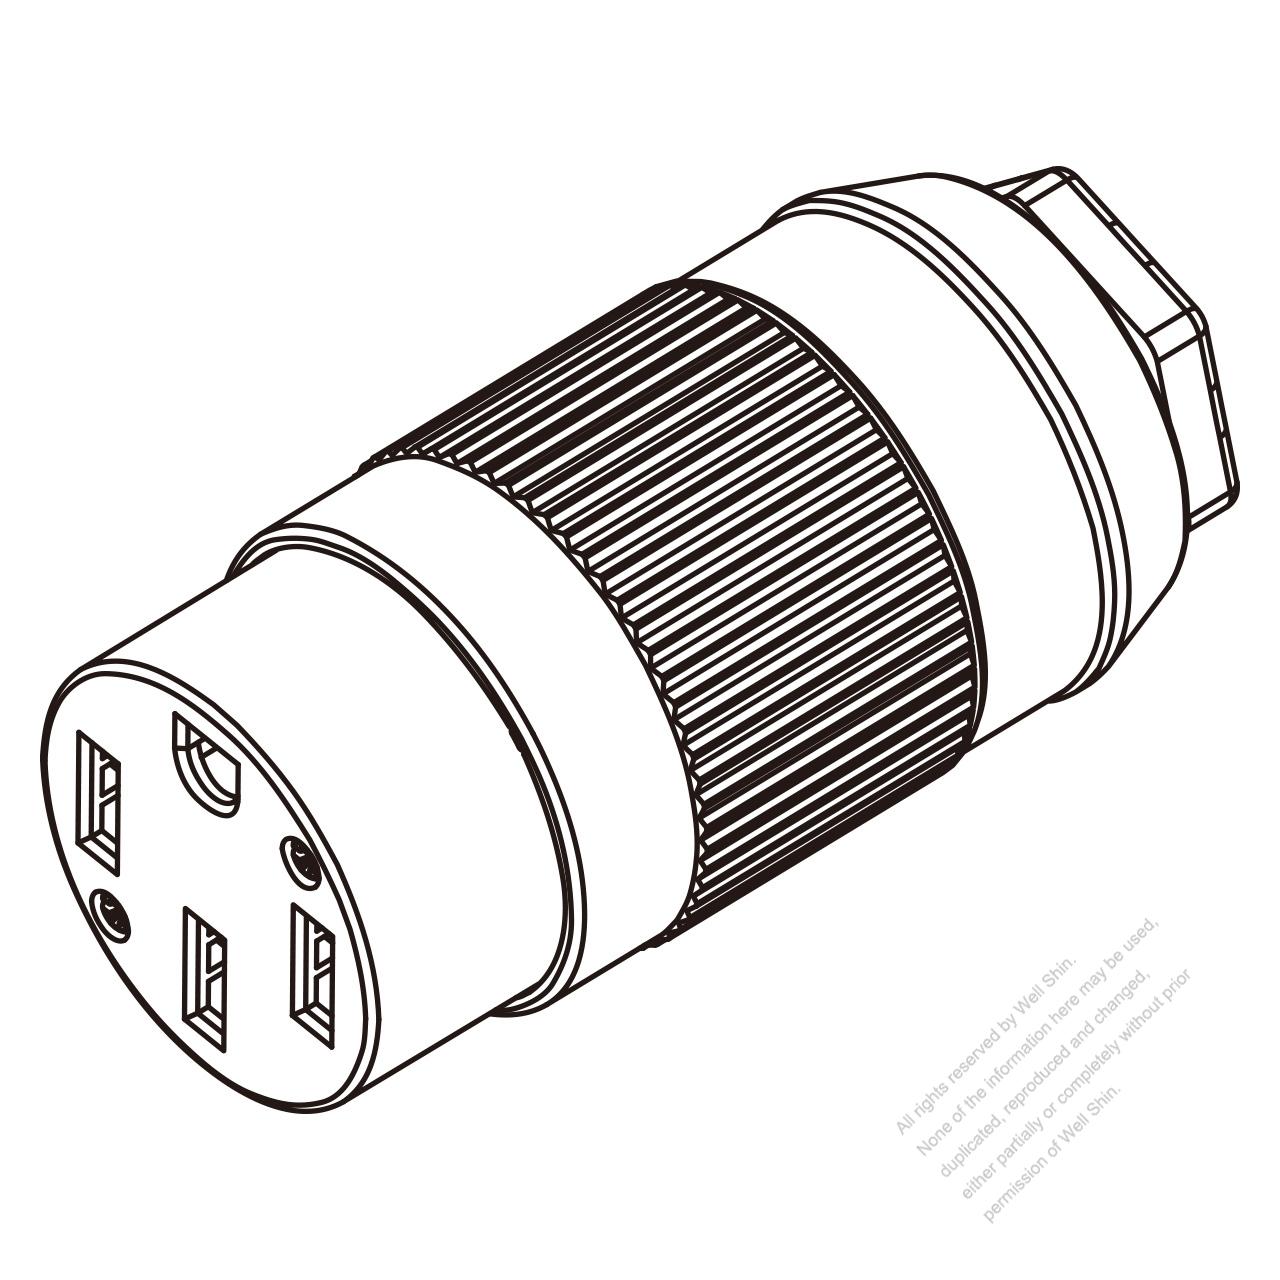 Nema 14 50r >> Usa Canada Connector Nema 14 50r 4 Pin 3 P 4 Wire Grounding50a